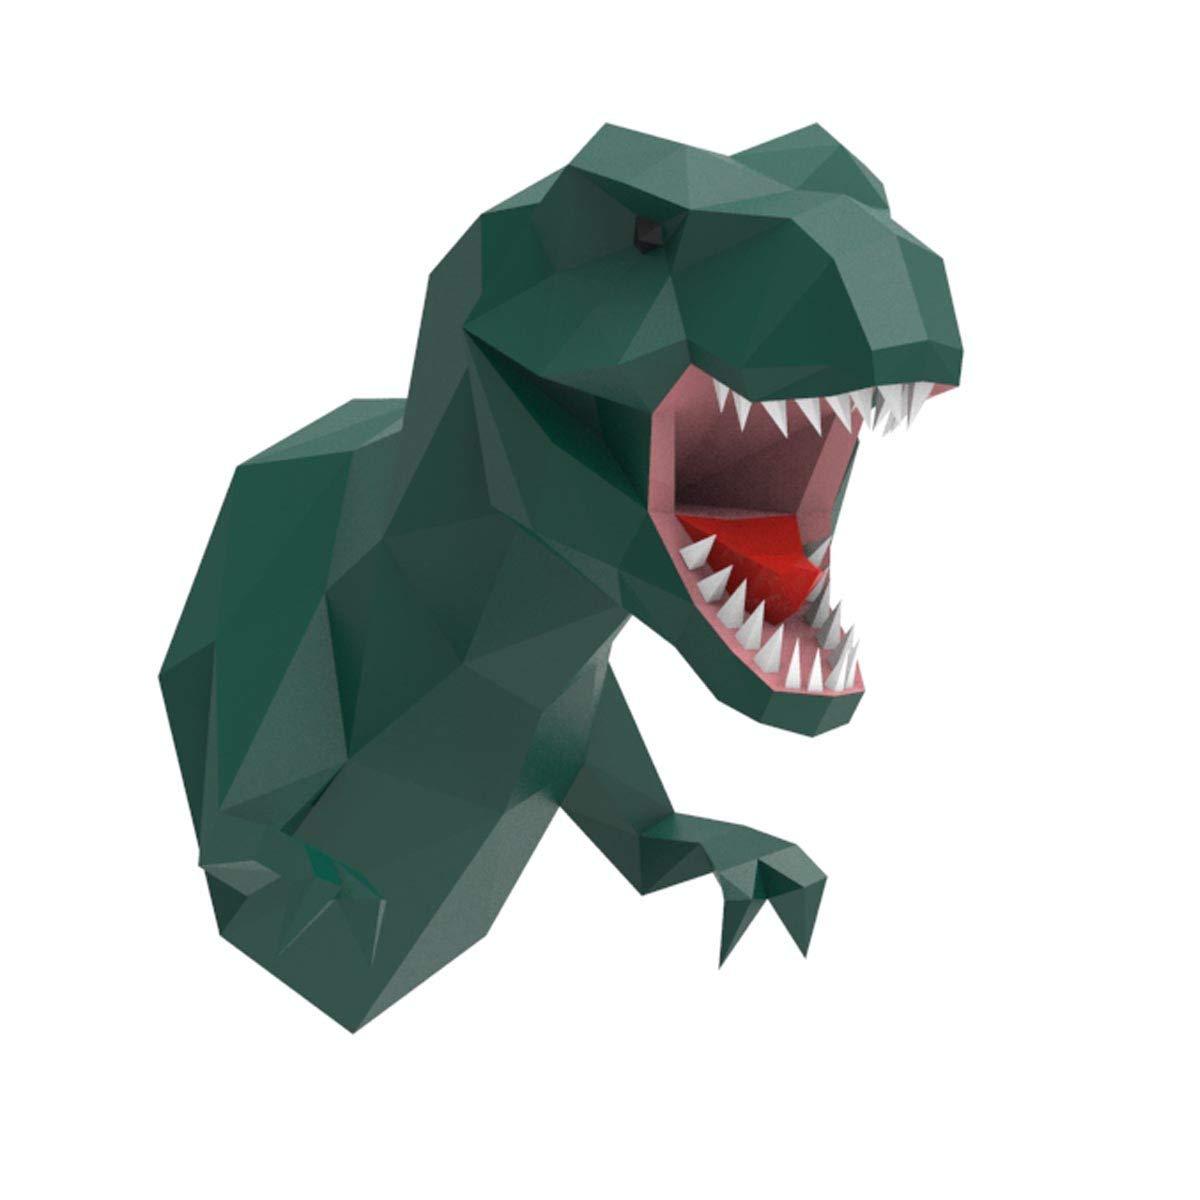 ENDARK T-Rex Head Wall Decor, DIY Papercraft Cardboard Animal 3D Head Wall Mount Tyrannosaurus Rex Paper Trophy Green